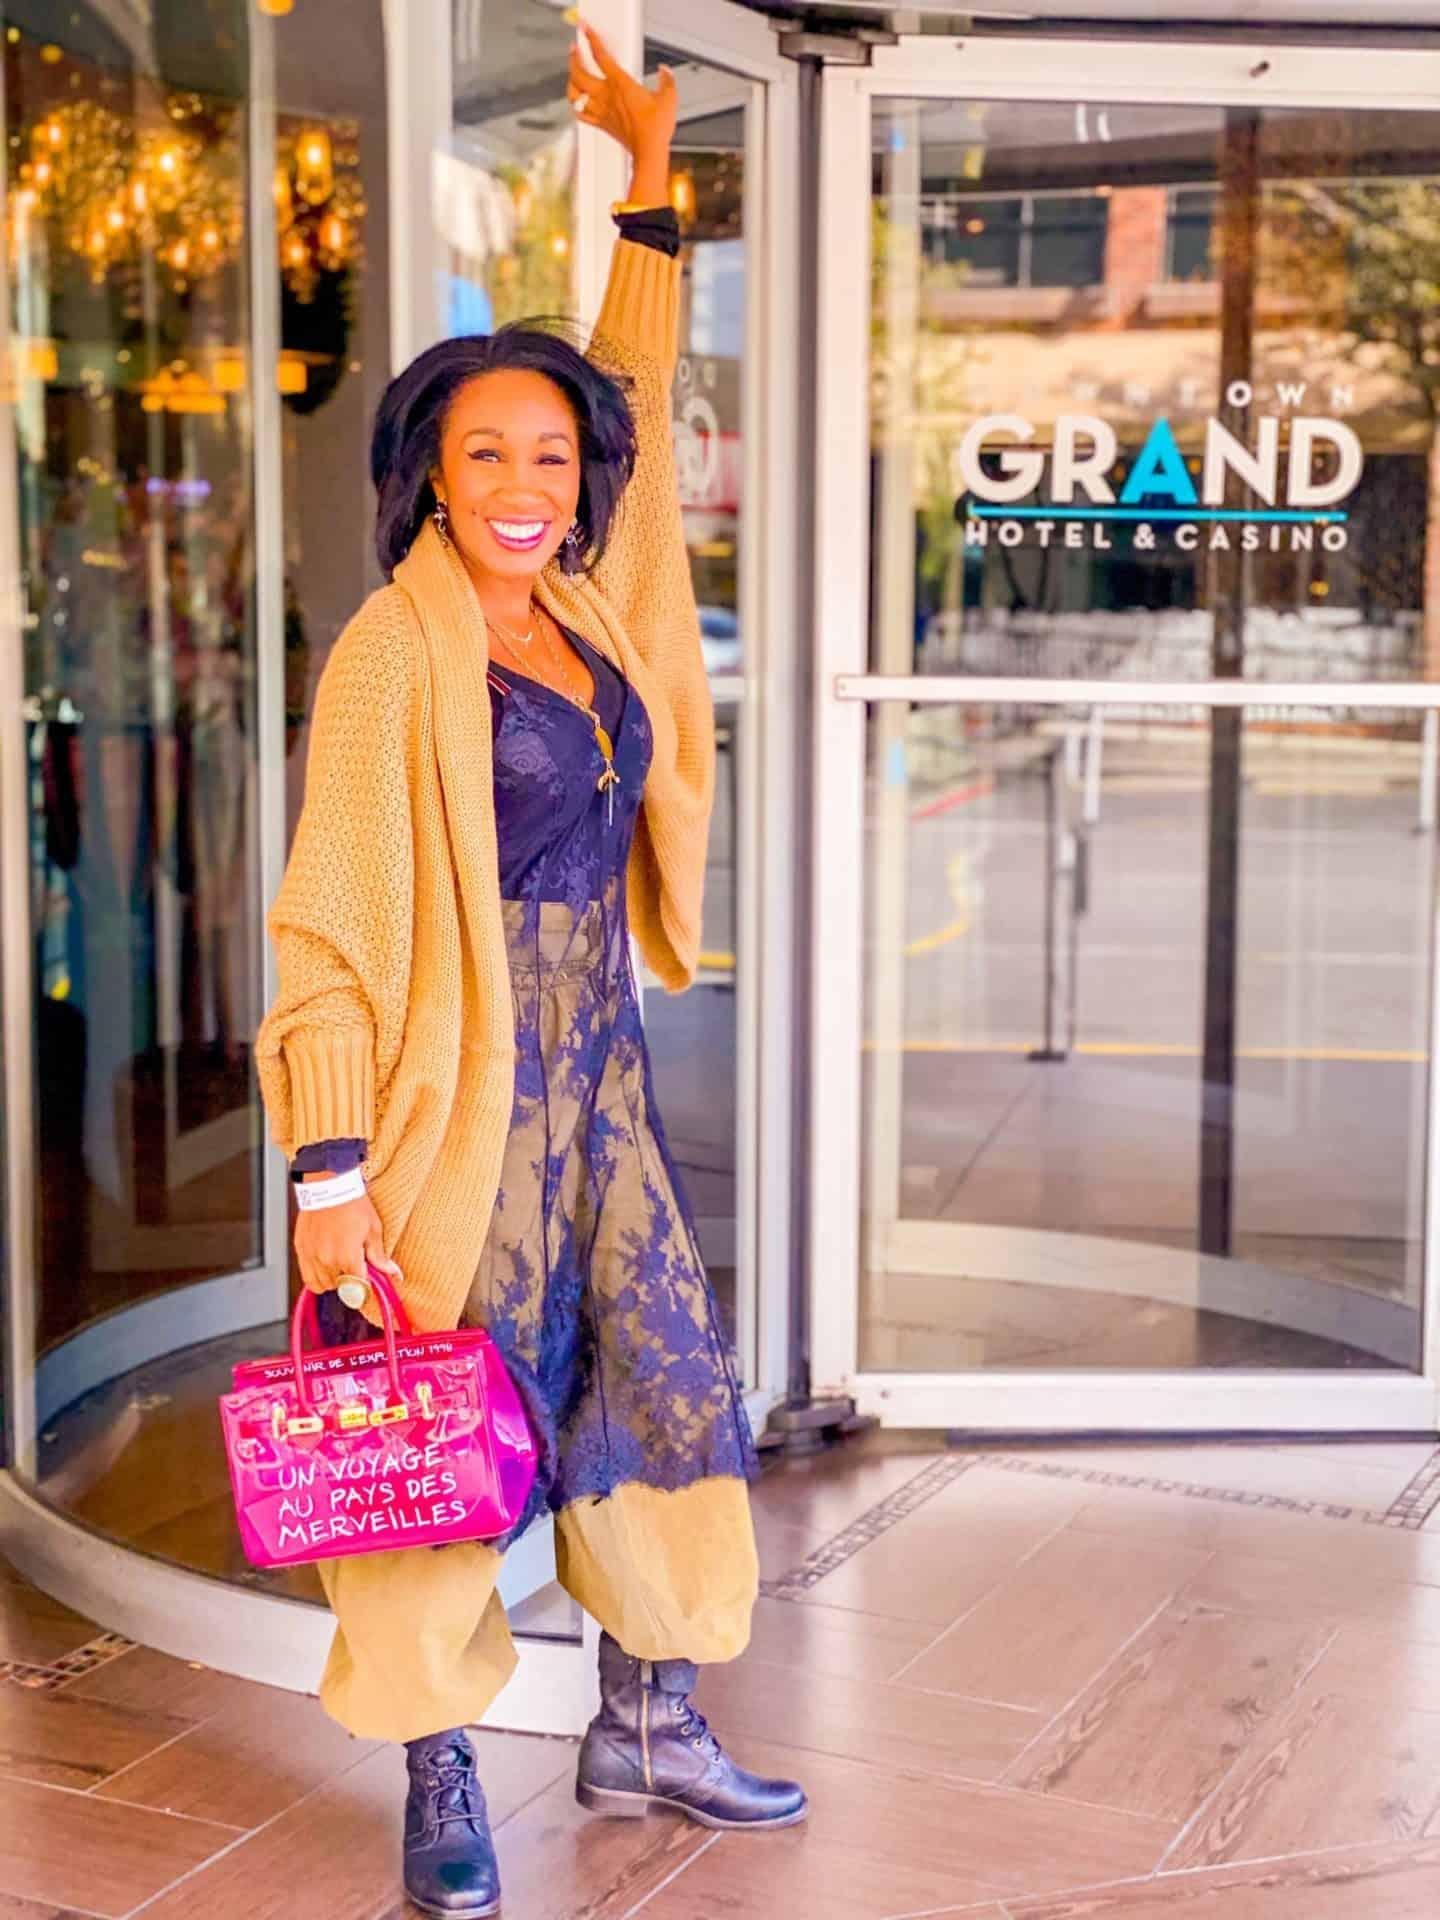 Downtown Grand Hotel & Casino Las Vegas Welcomes Influencer Shaunda Necole